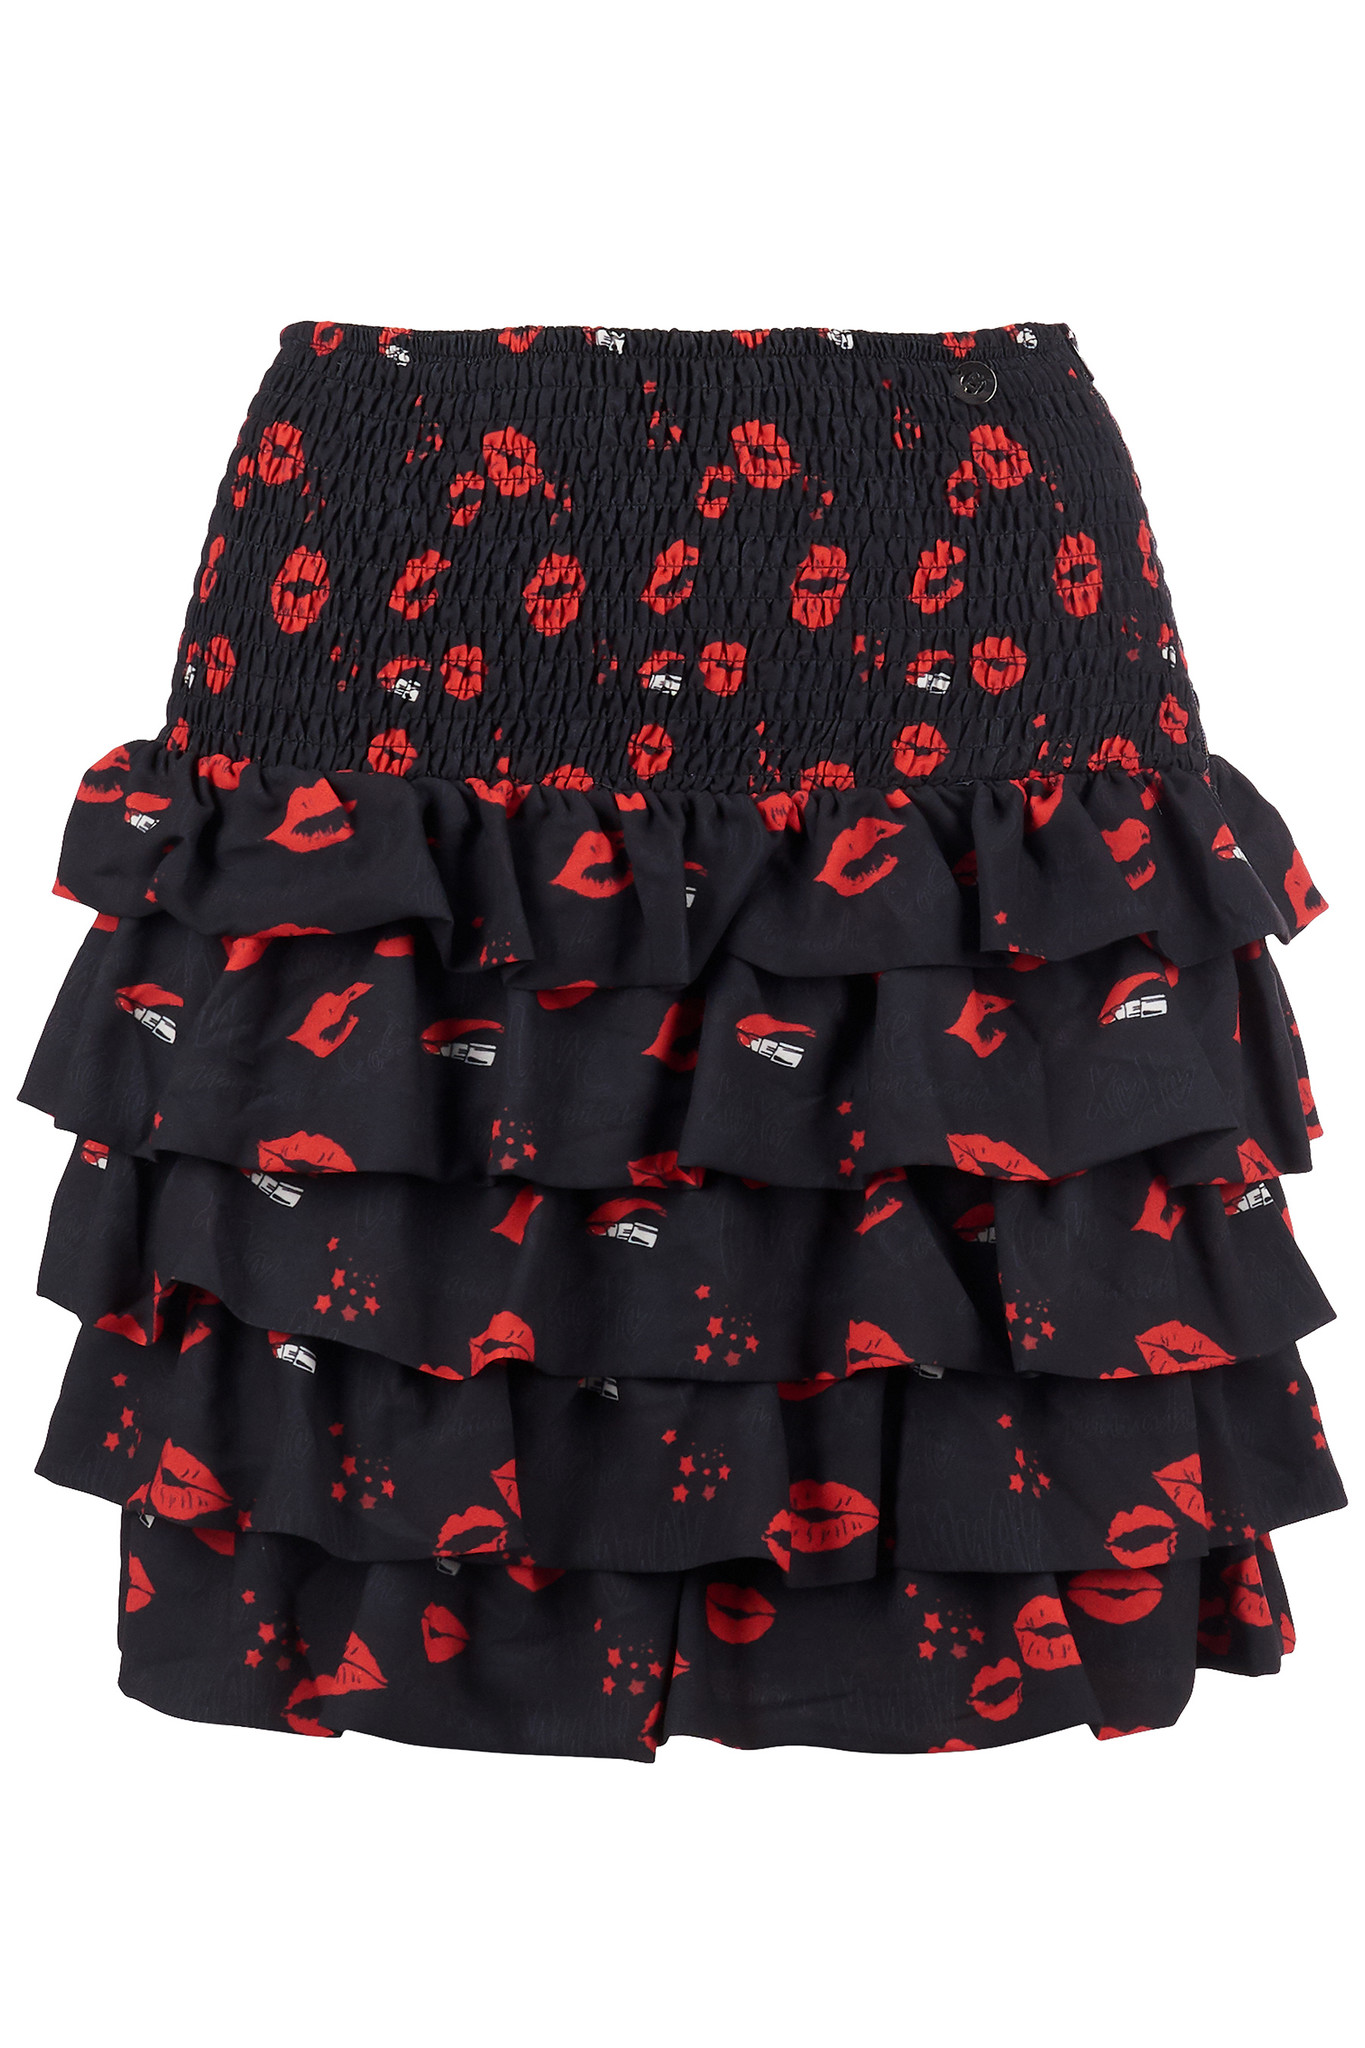 Royal Temptation Skirt lipjes RYL-582